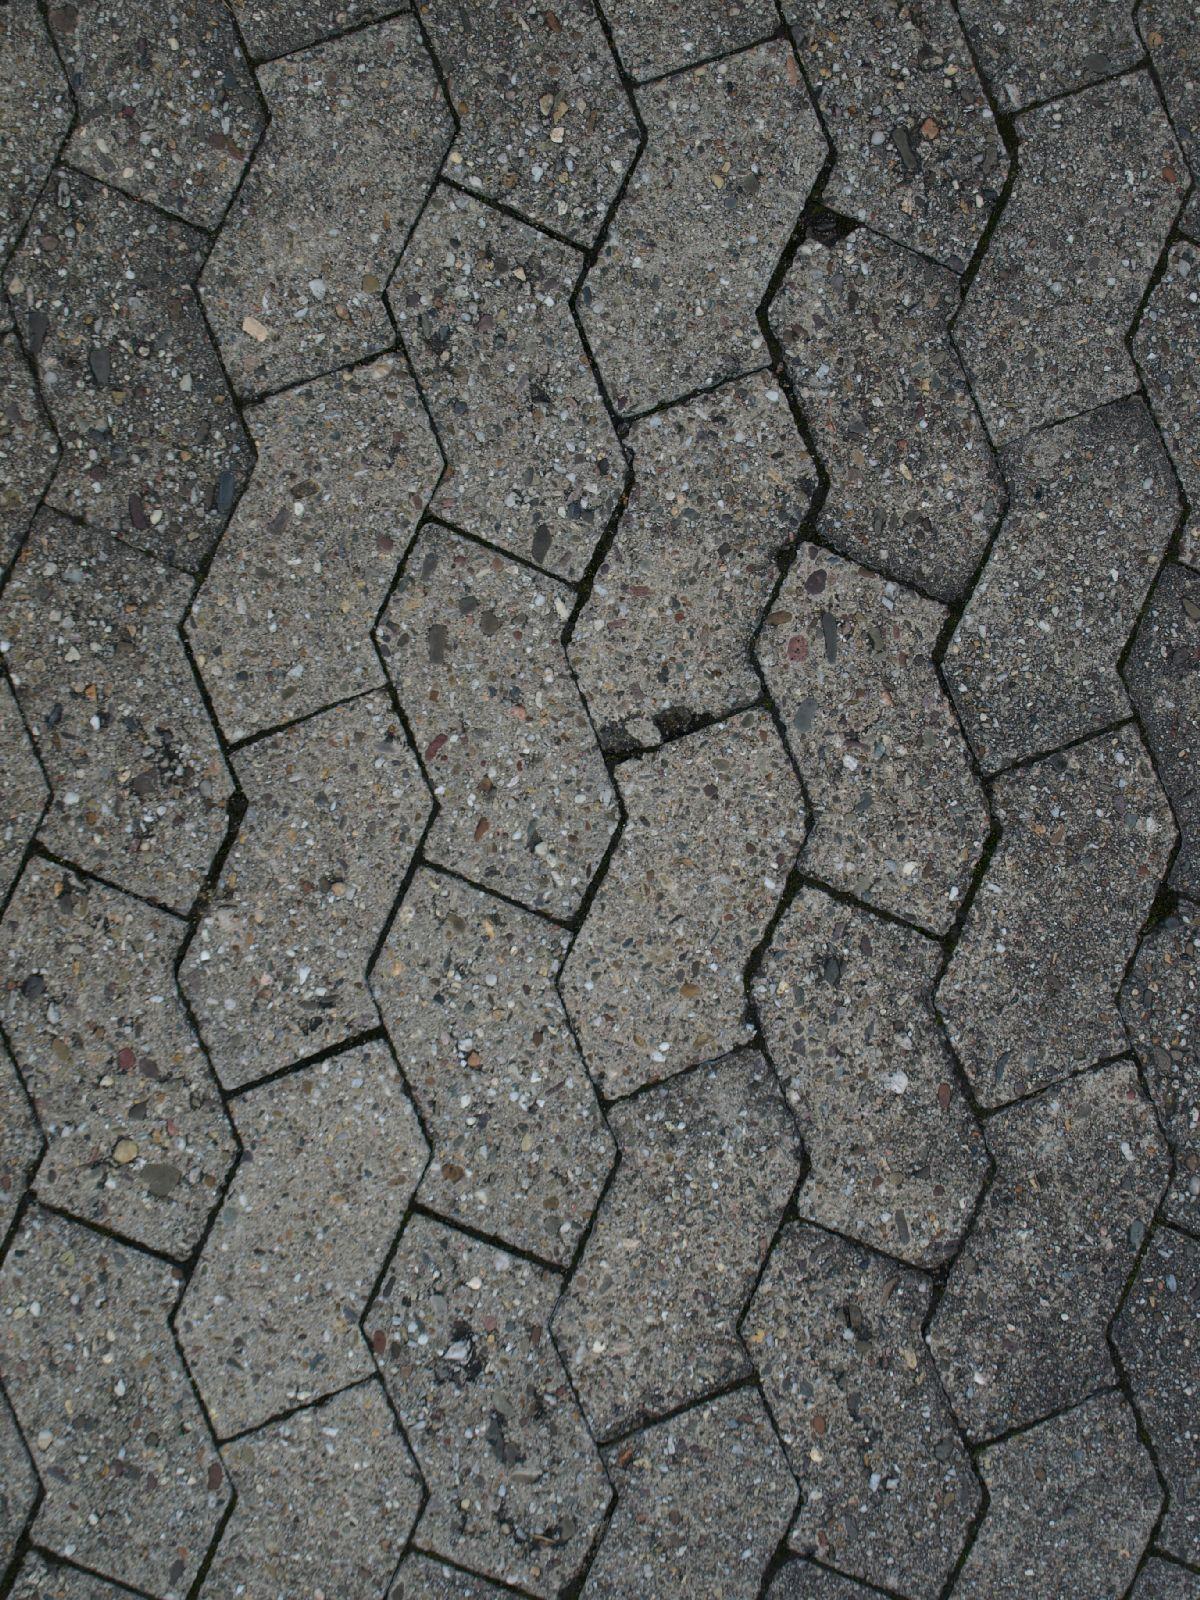 Boden-Gehweg-Strasse-Buergersteig-Textur_A_PA116024